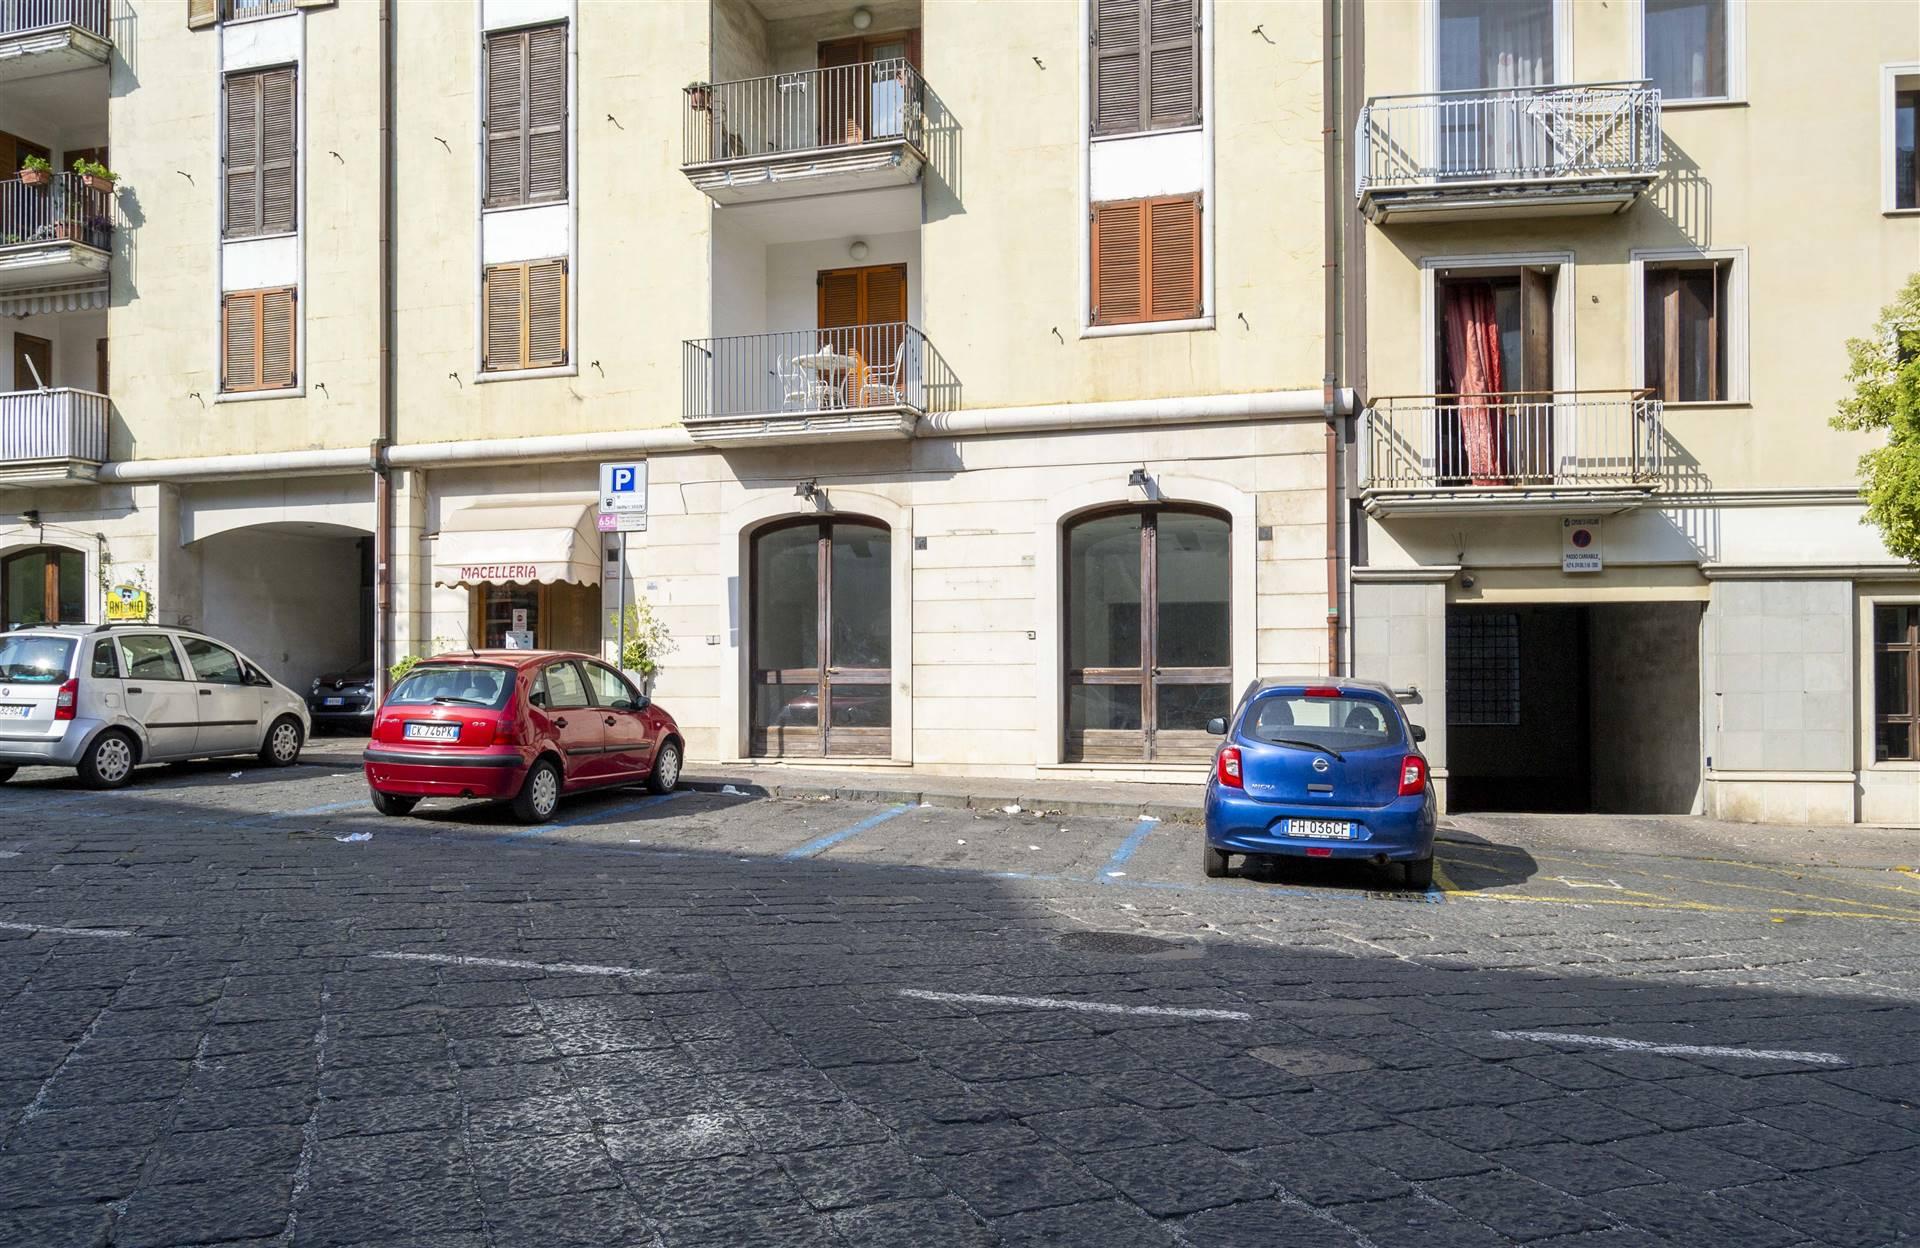 Locale commerciale a Avellino